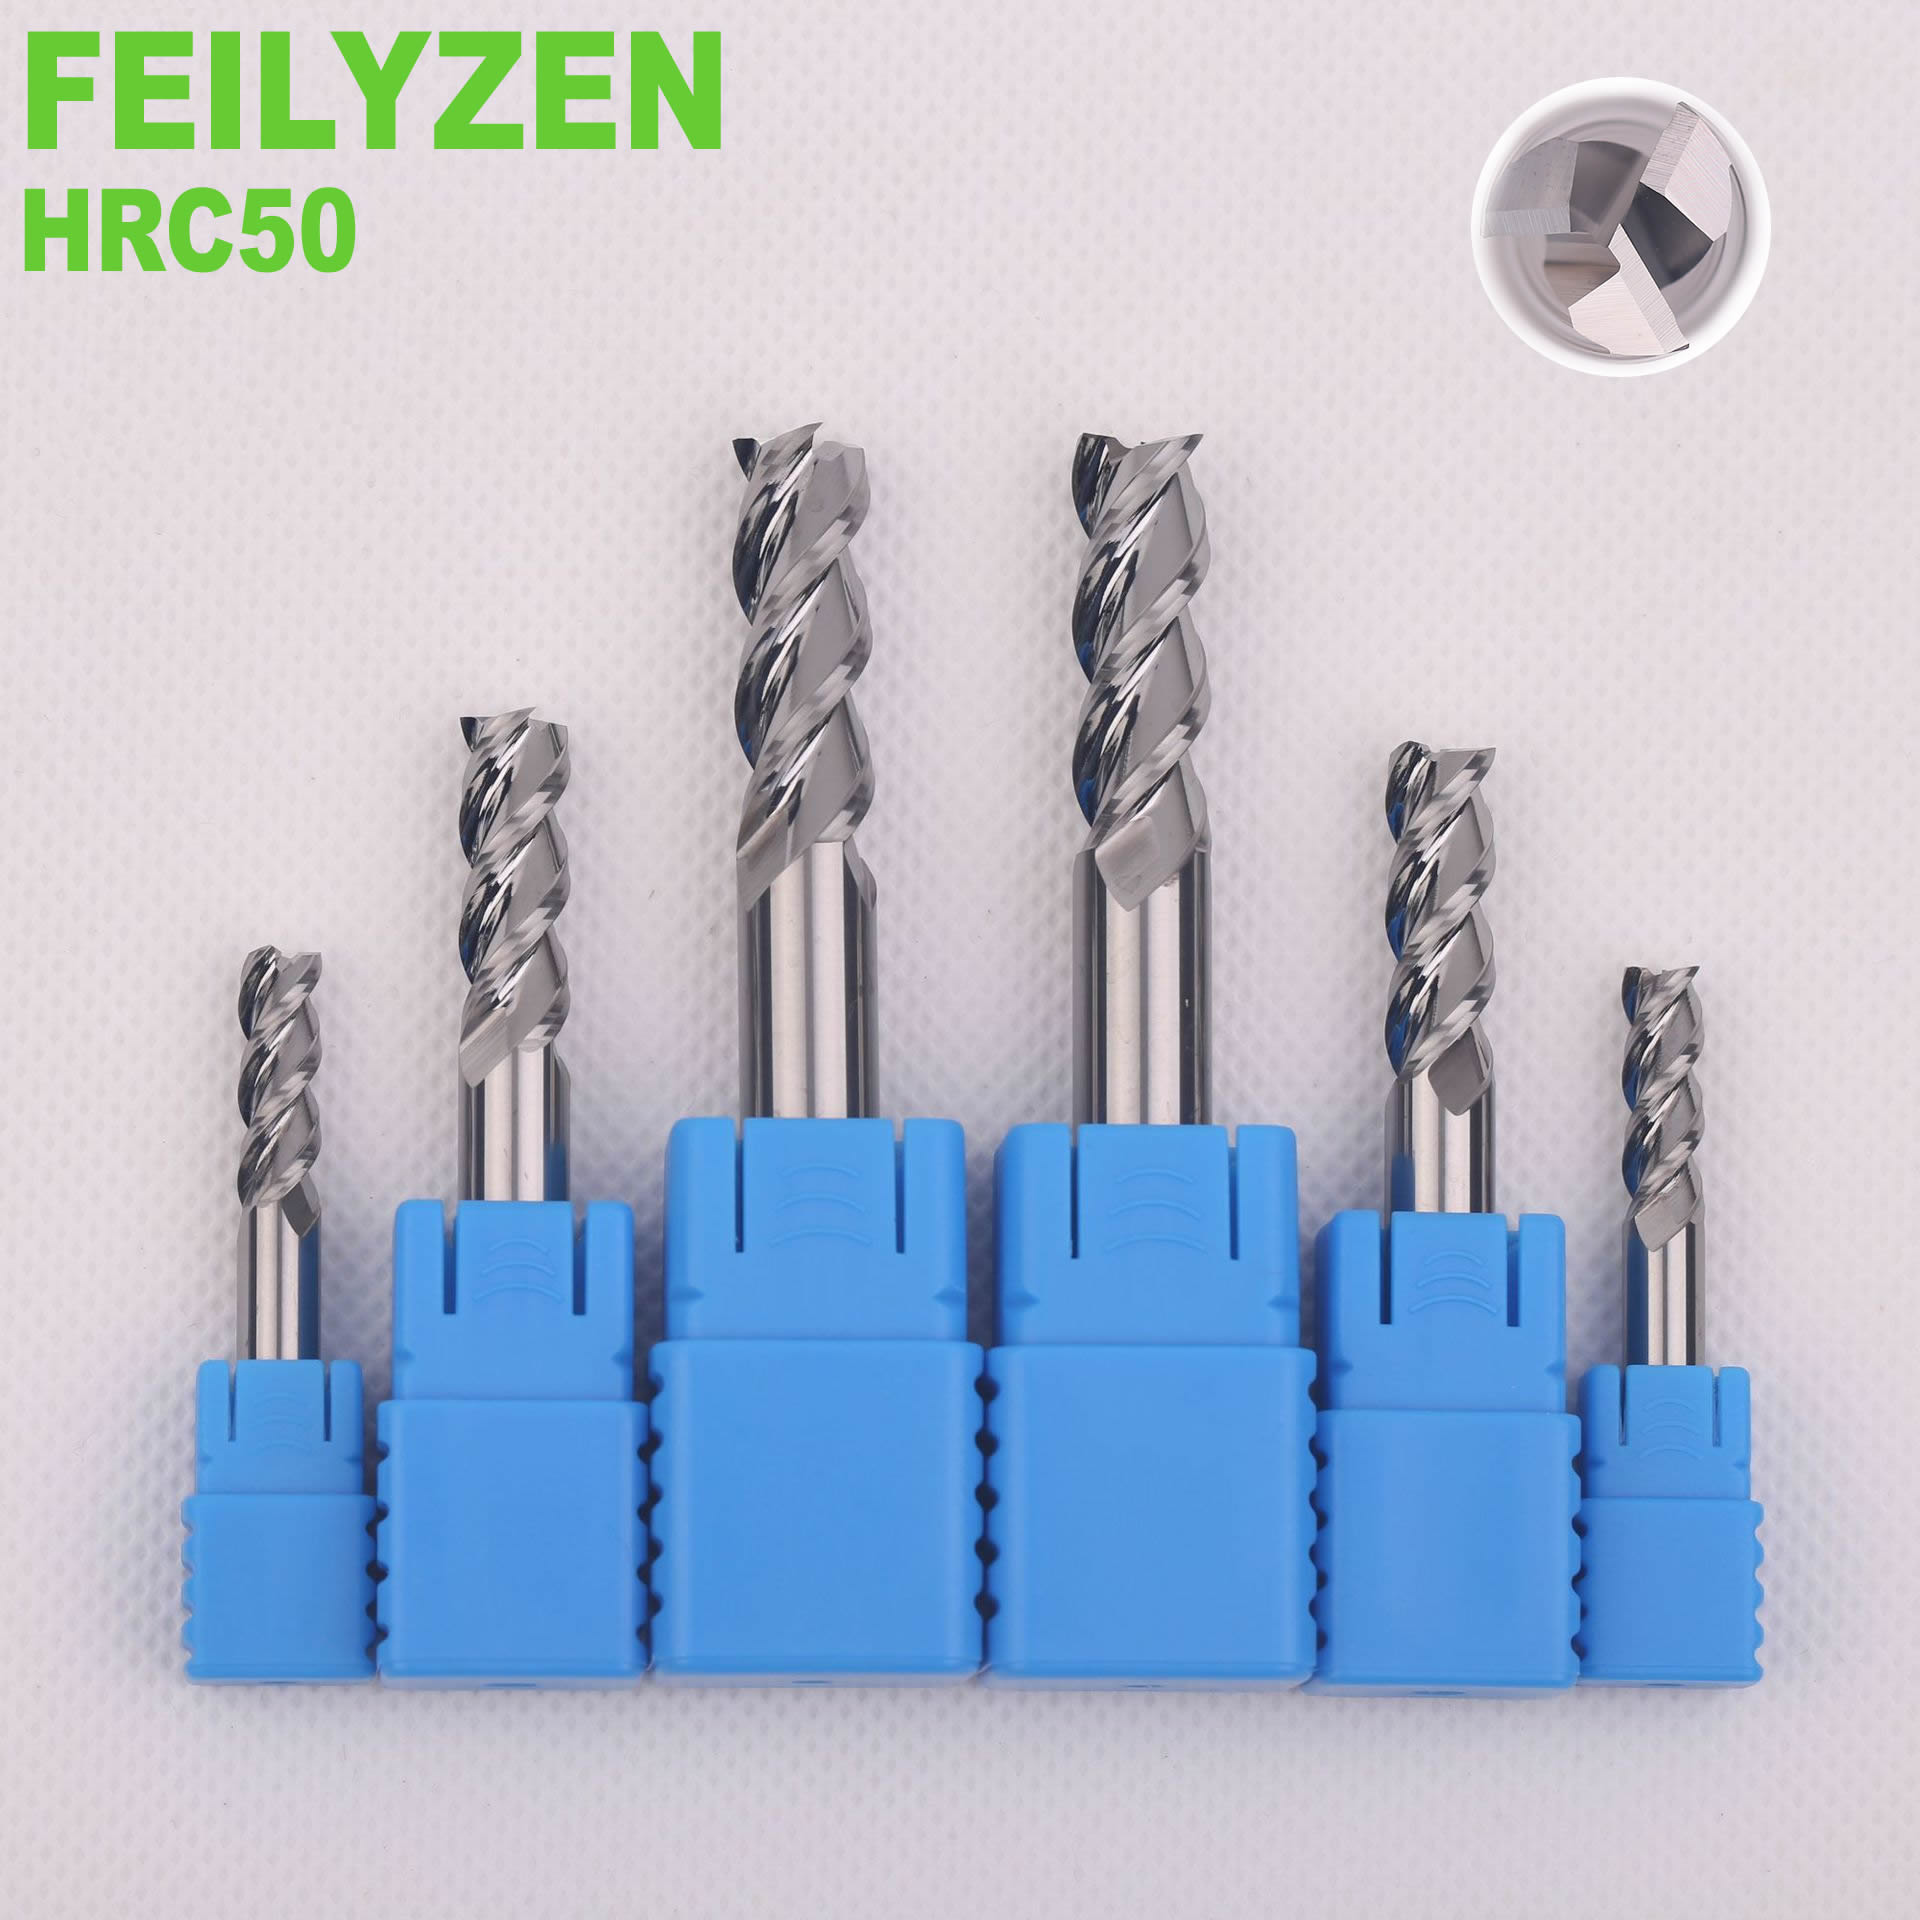 FEILYZEN Solid Carbide Flat End Mill For Aluminum 3 Flutes Tungsten Steel CNC Milling Cutter CNC Router Bits HRC50